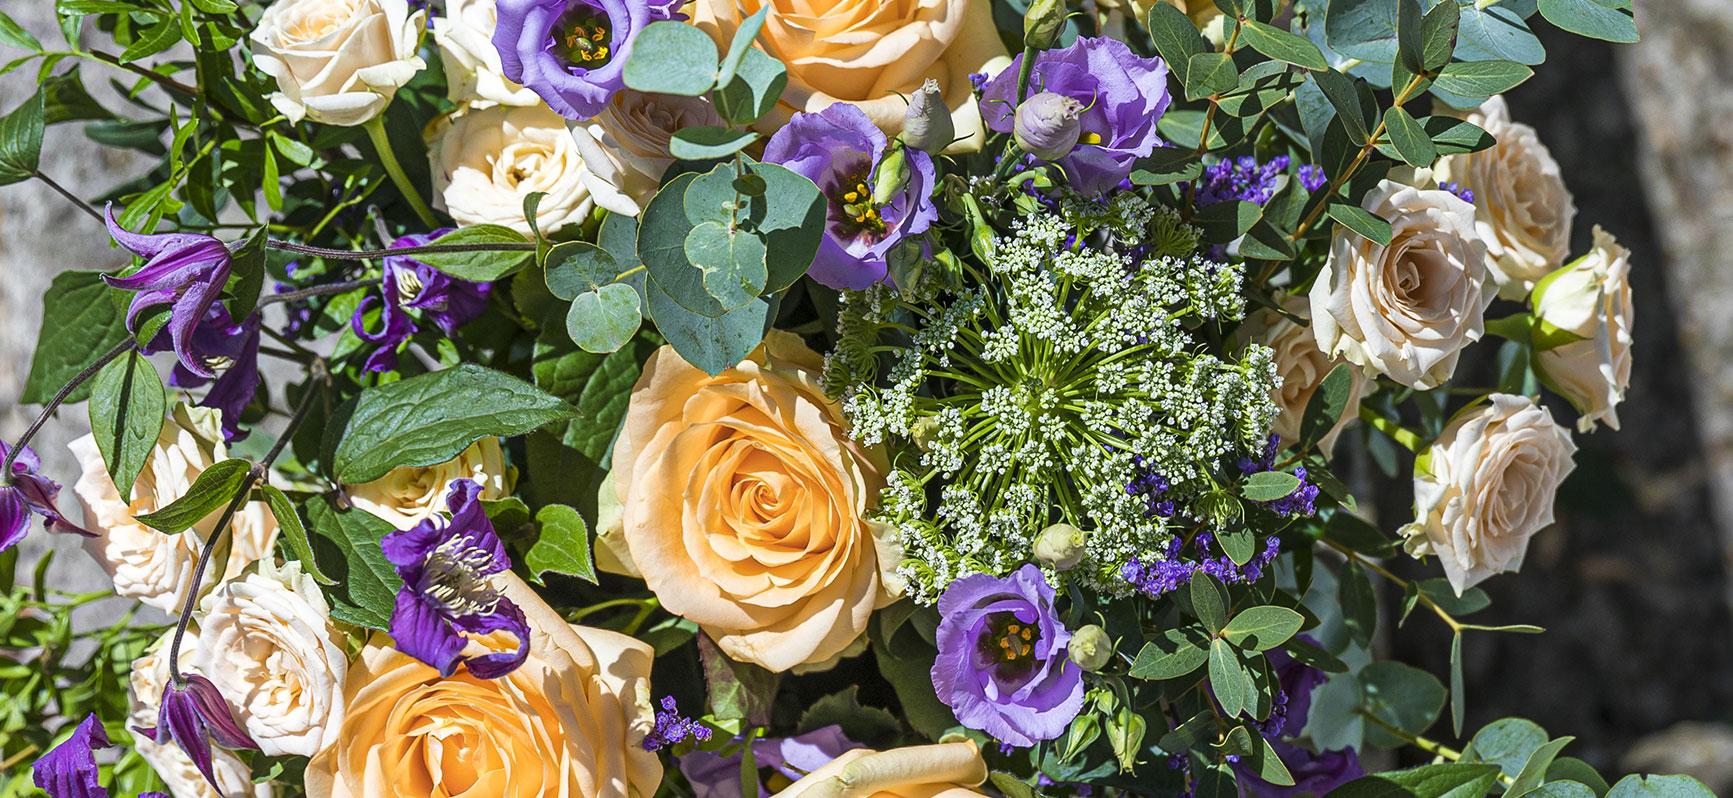 jane-luce-bouquets-header